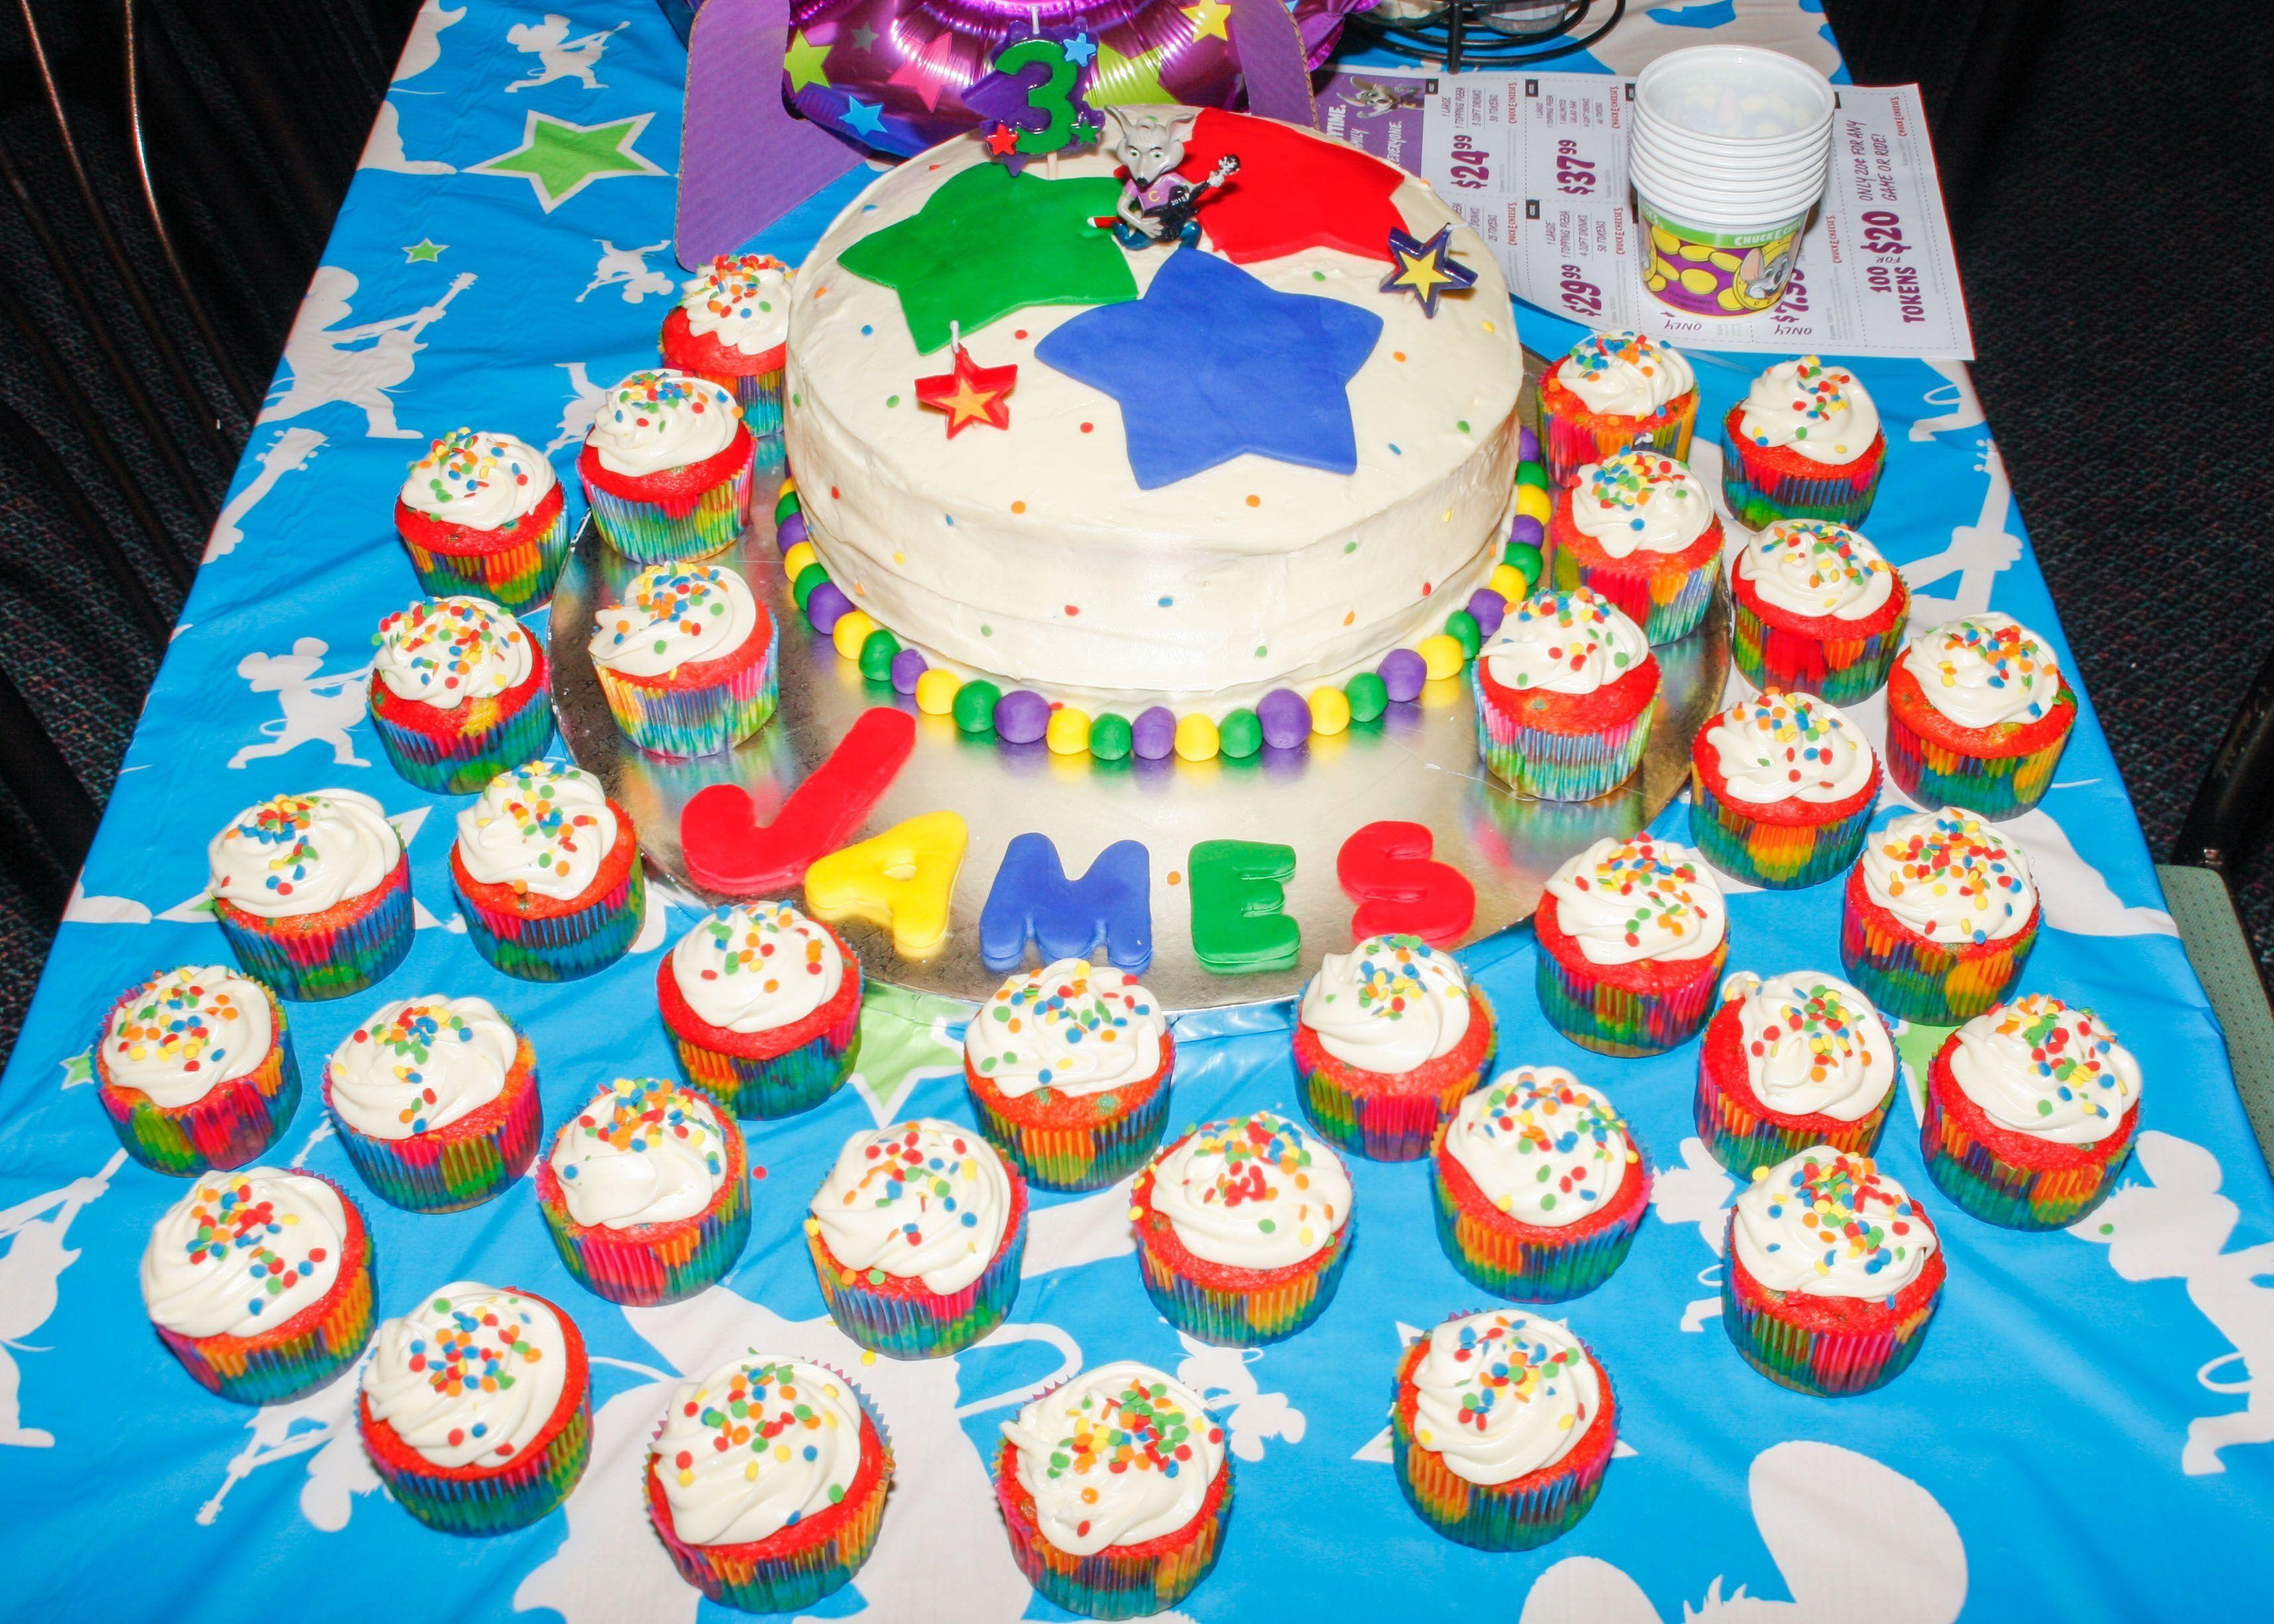 Cheesecake decoration ideas fresh chuck e cheese cake